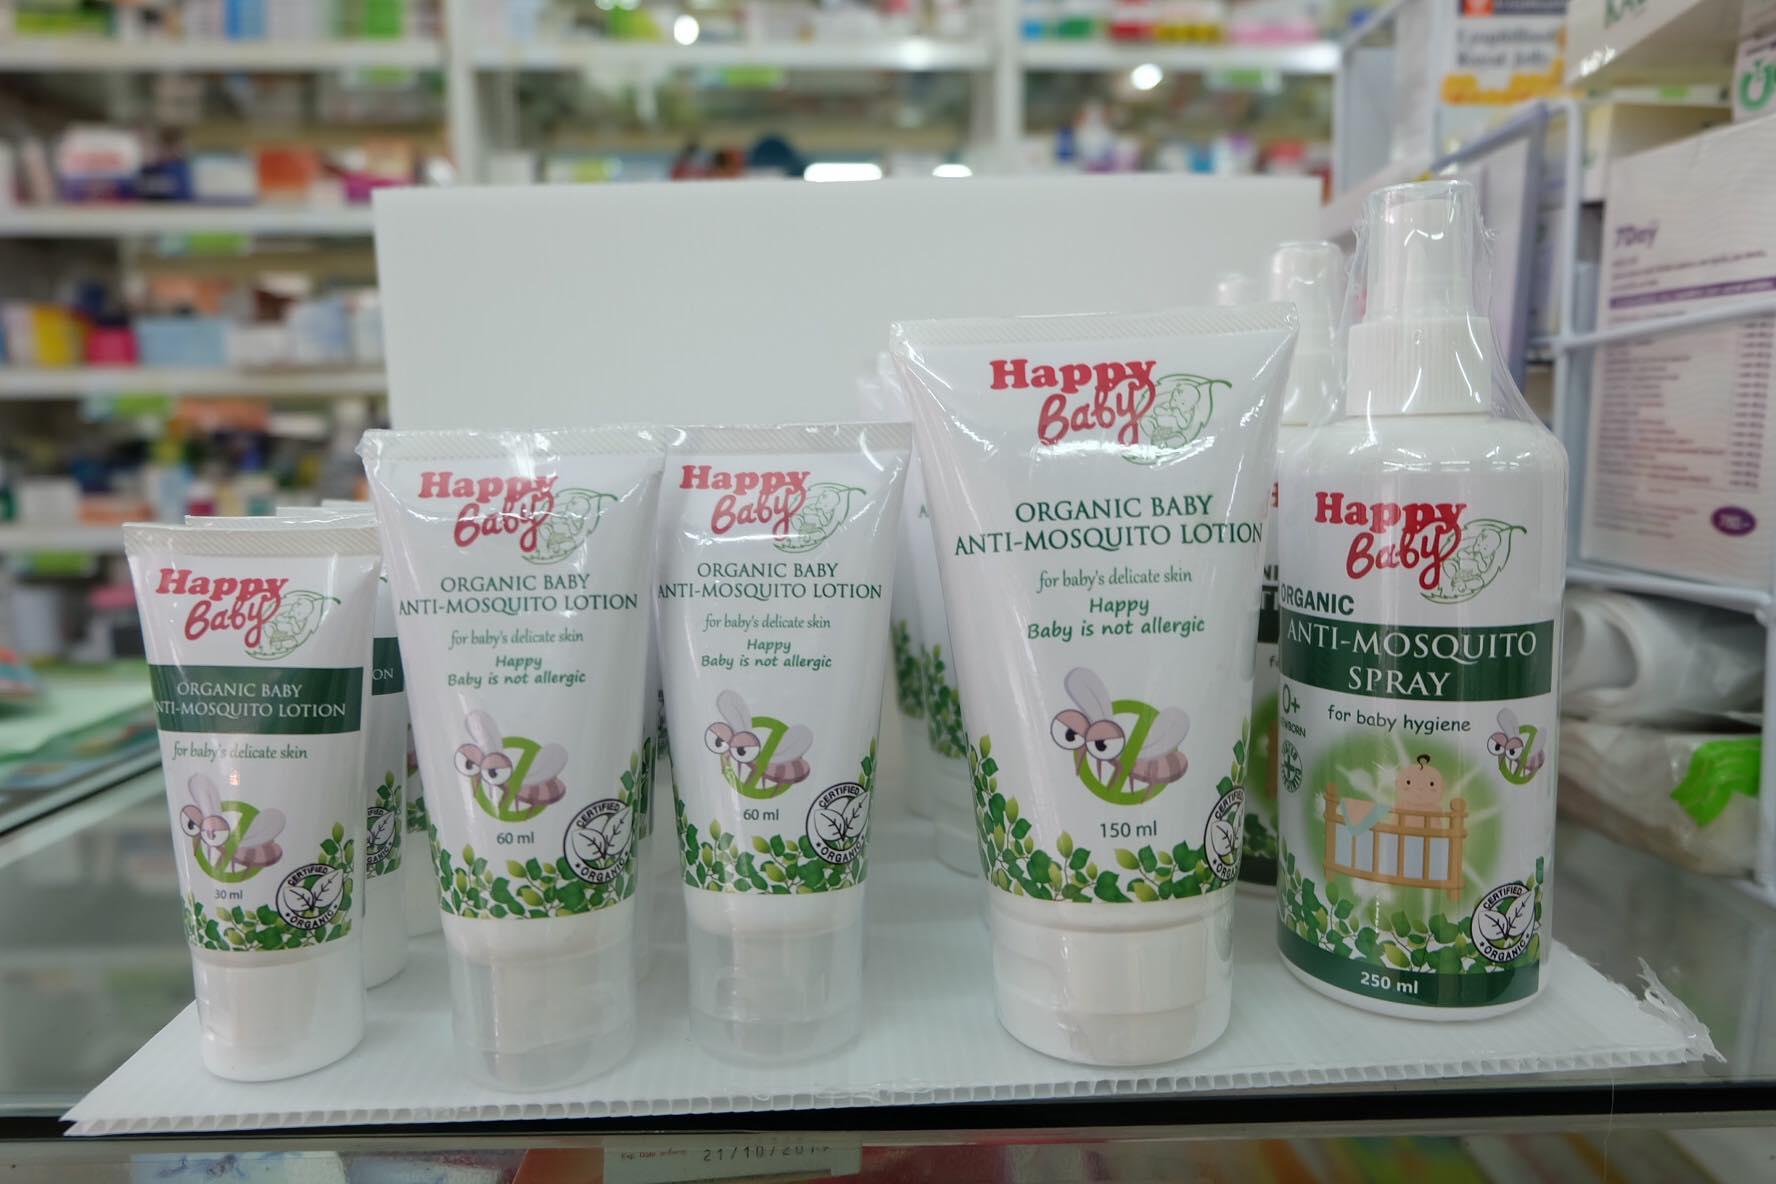 Happy baby organic กันยุง 30 ml